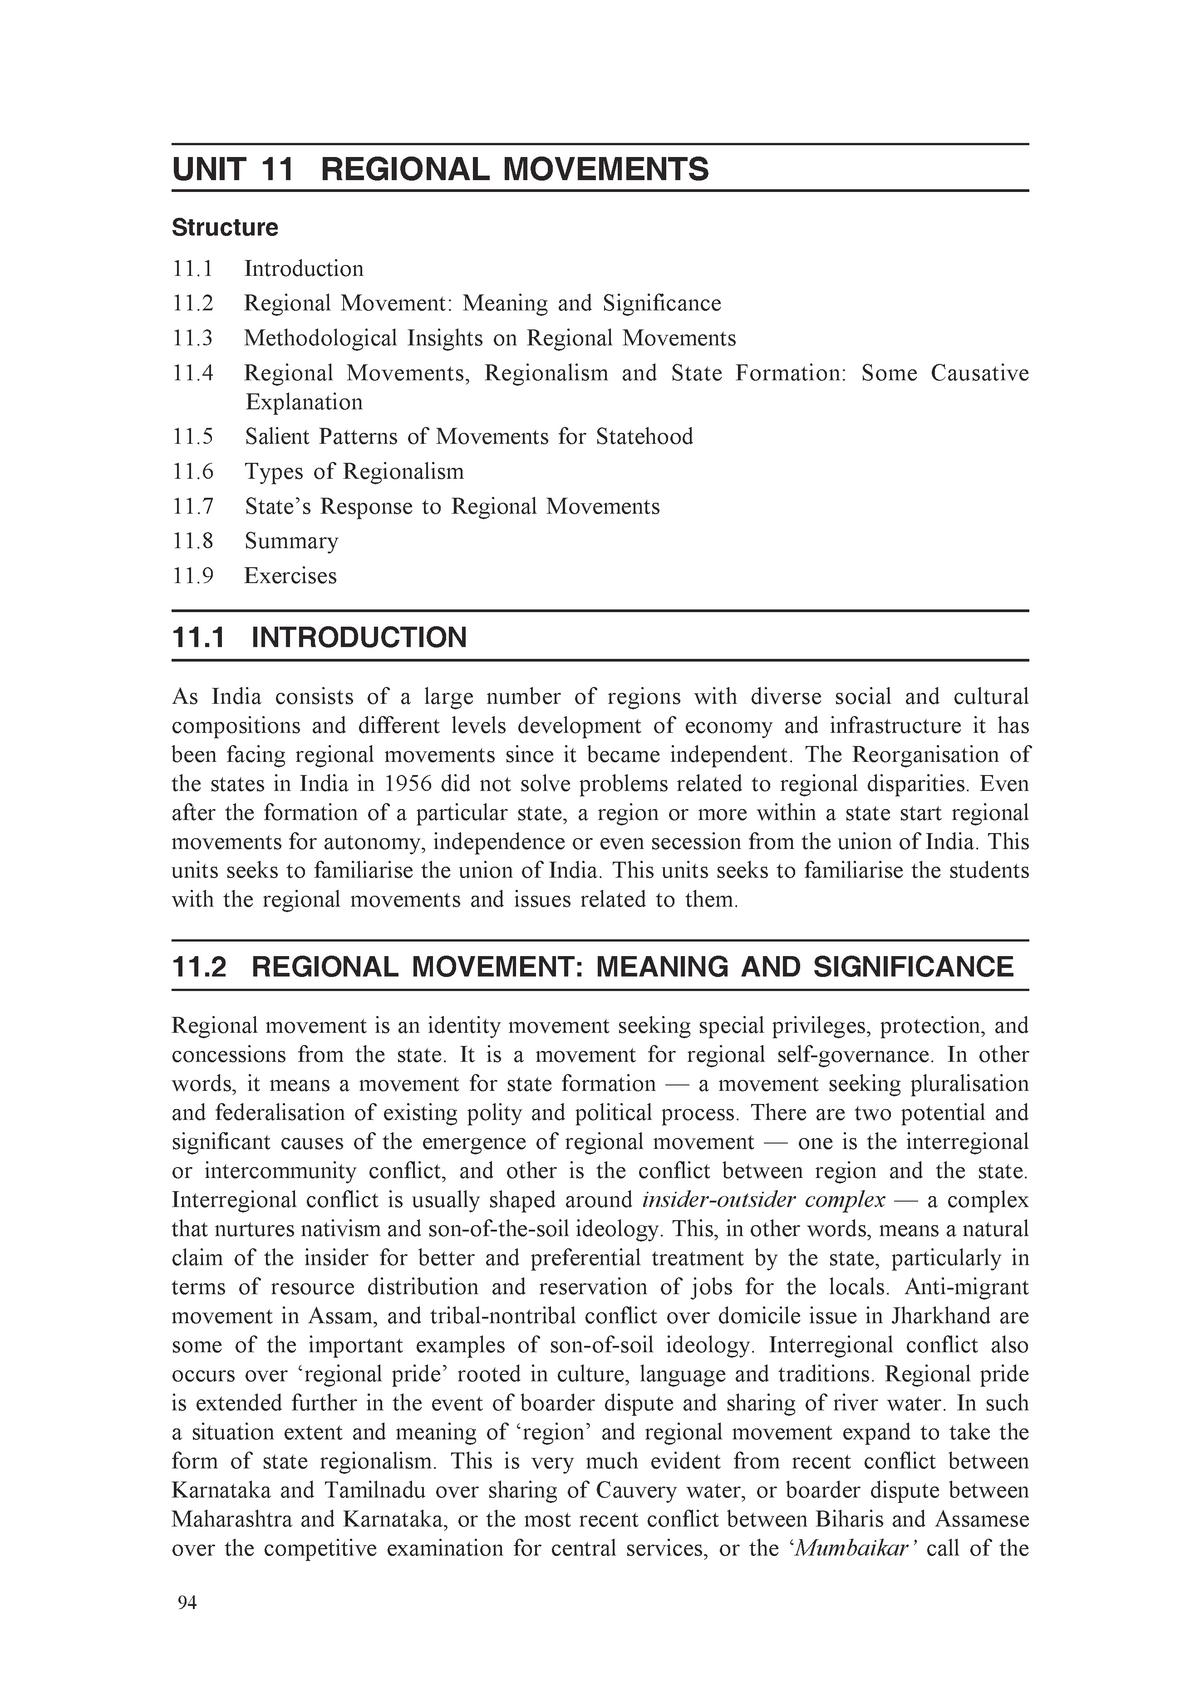 Regional Movements - Good Notes - Medische microbiologie